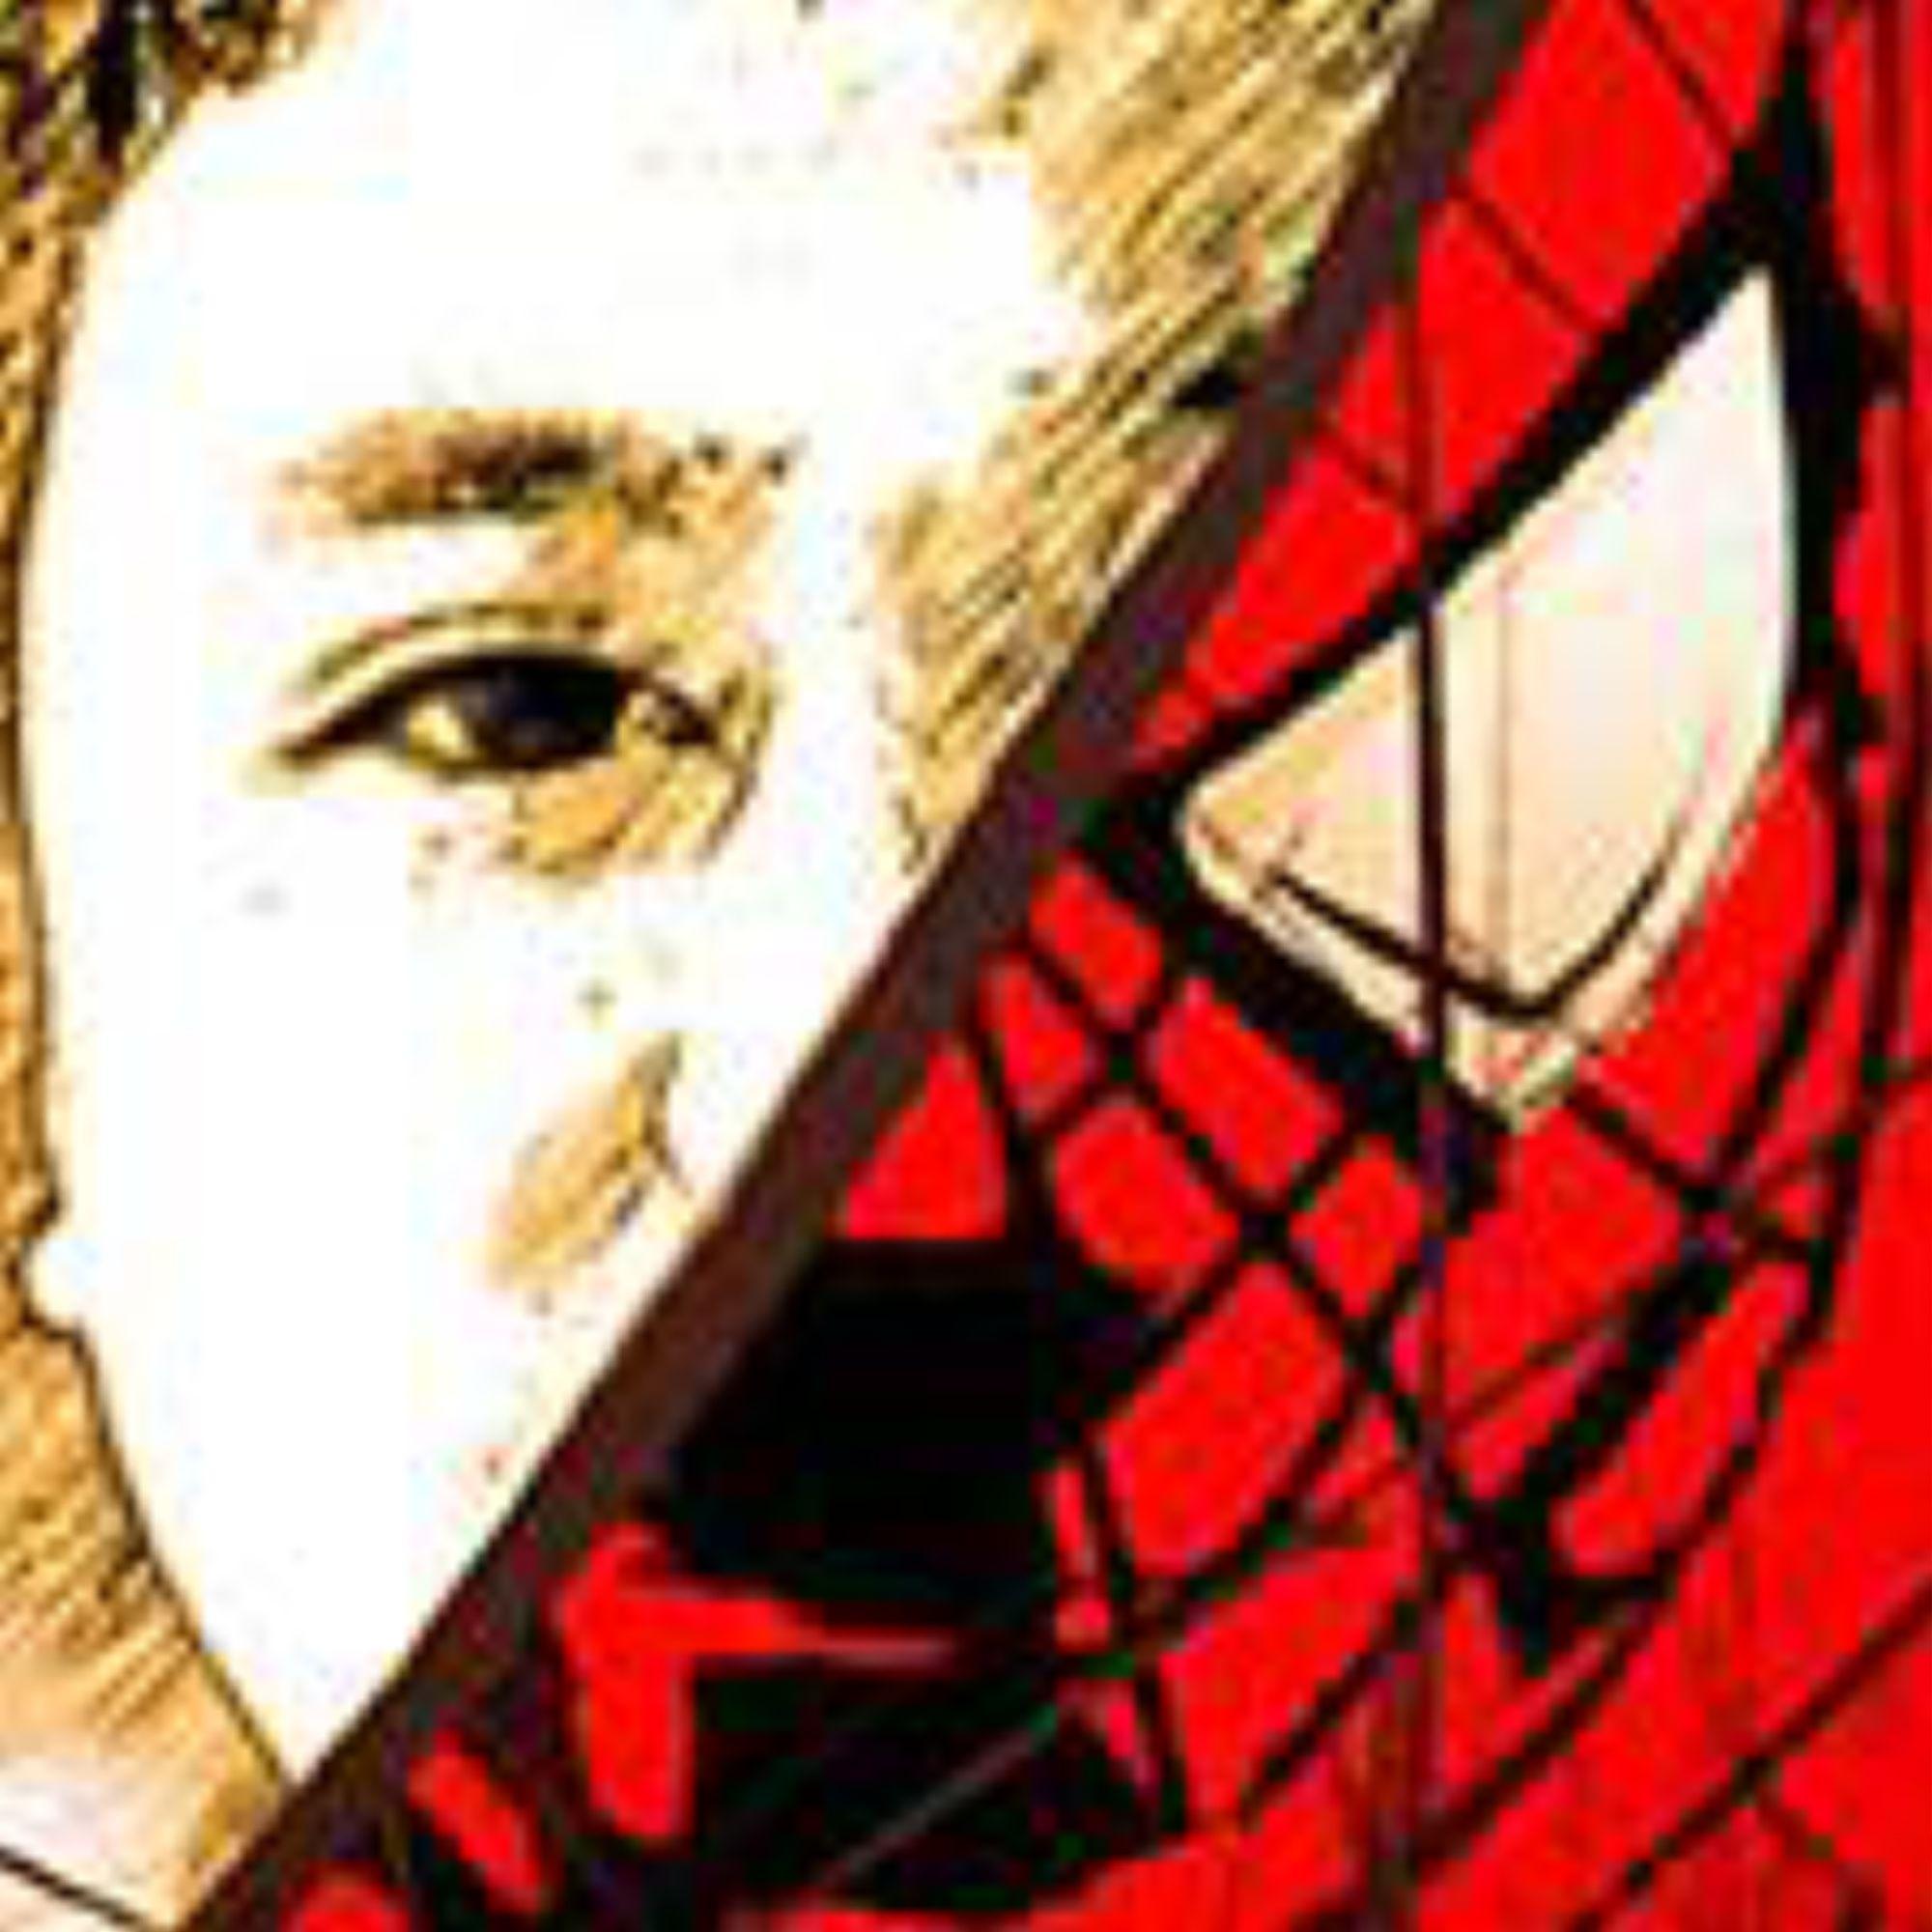 "<h3>德图""蜘蛛侠"":如果我有轻功 飞檐走壁</h3>"